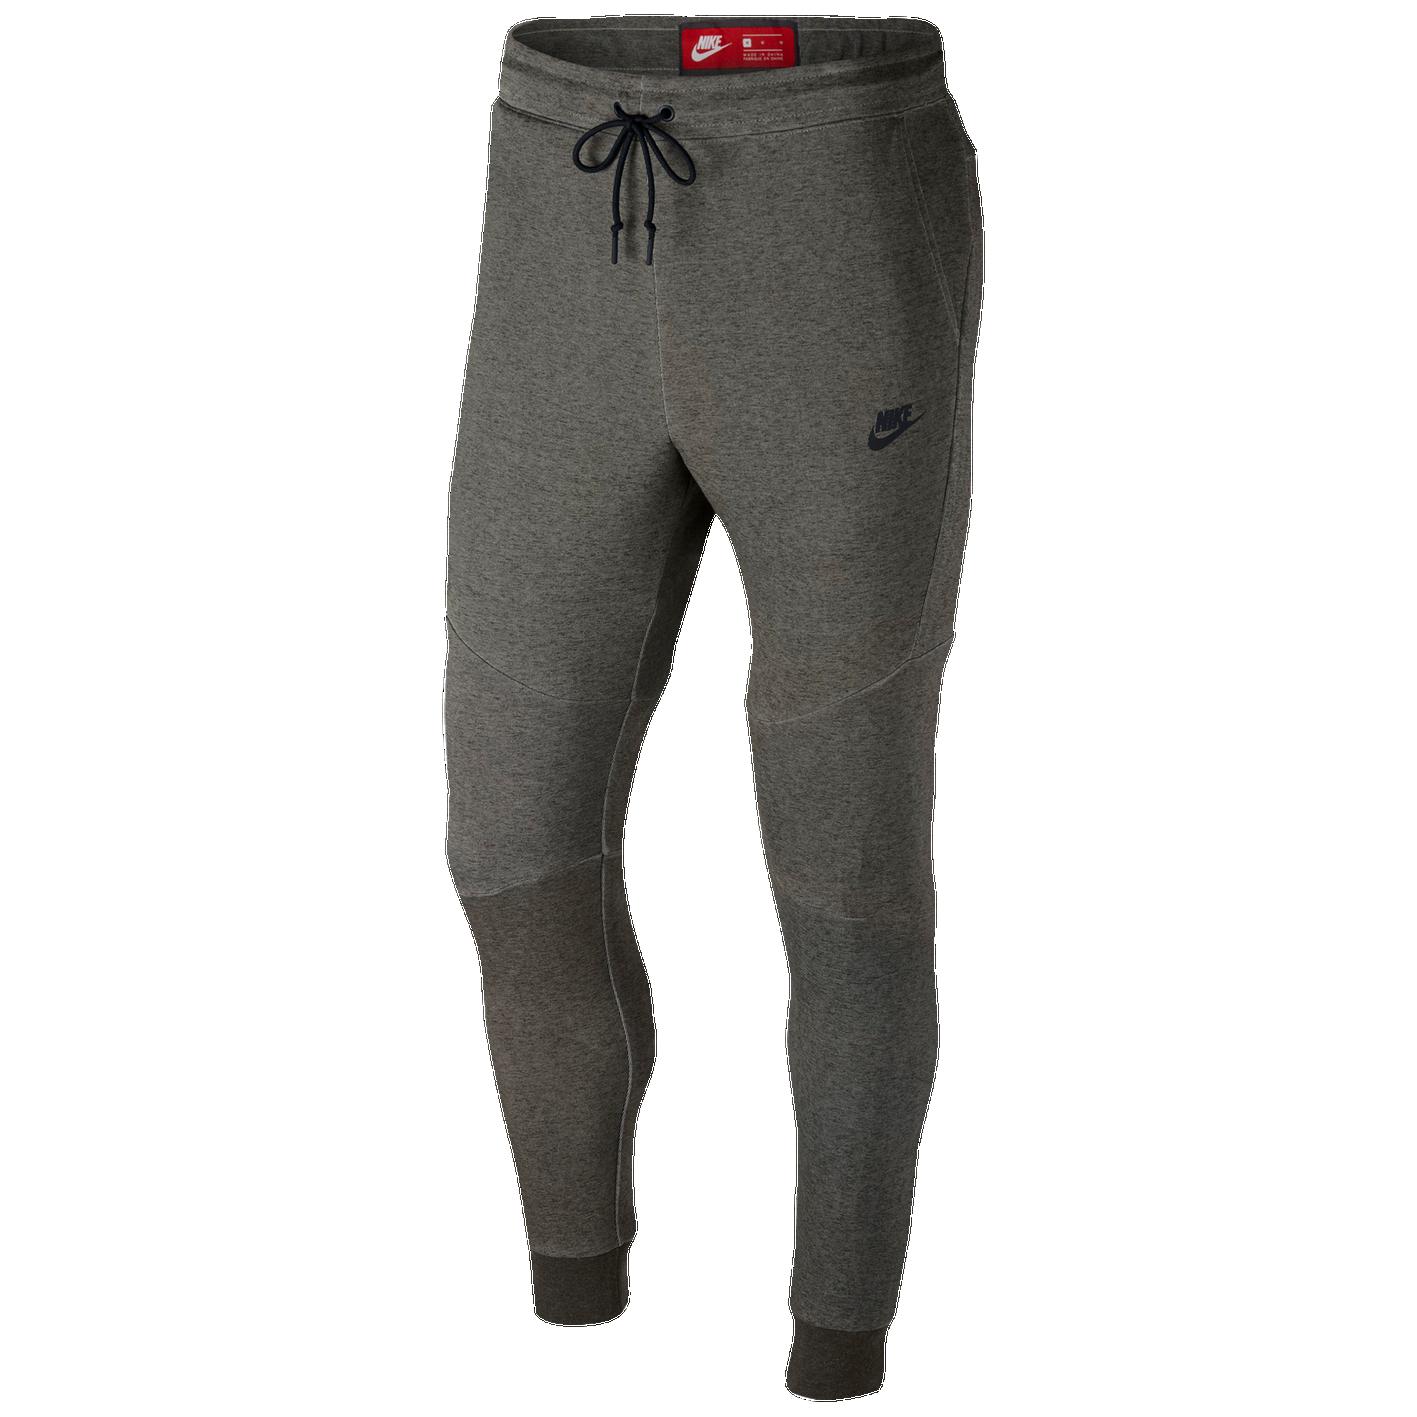 7b75bed208ce Nike Tech Fleece Jogger - Men s - Casual - Clothing - Sequoia ...